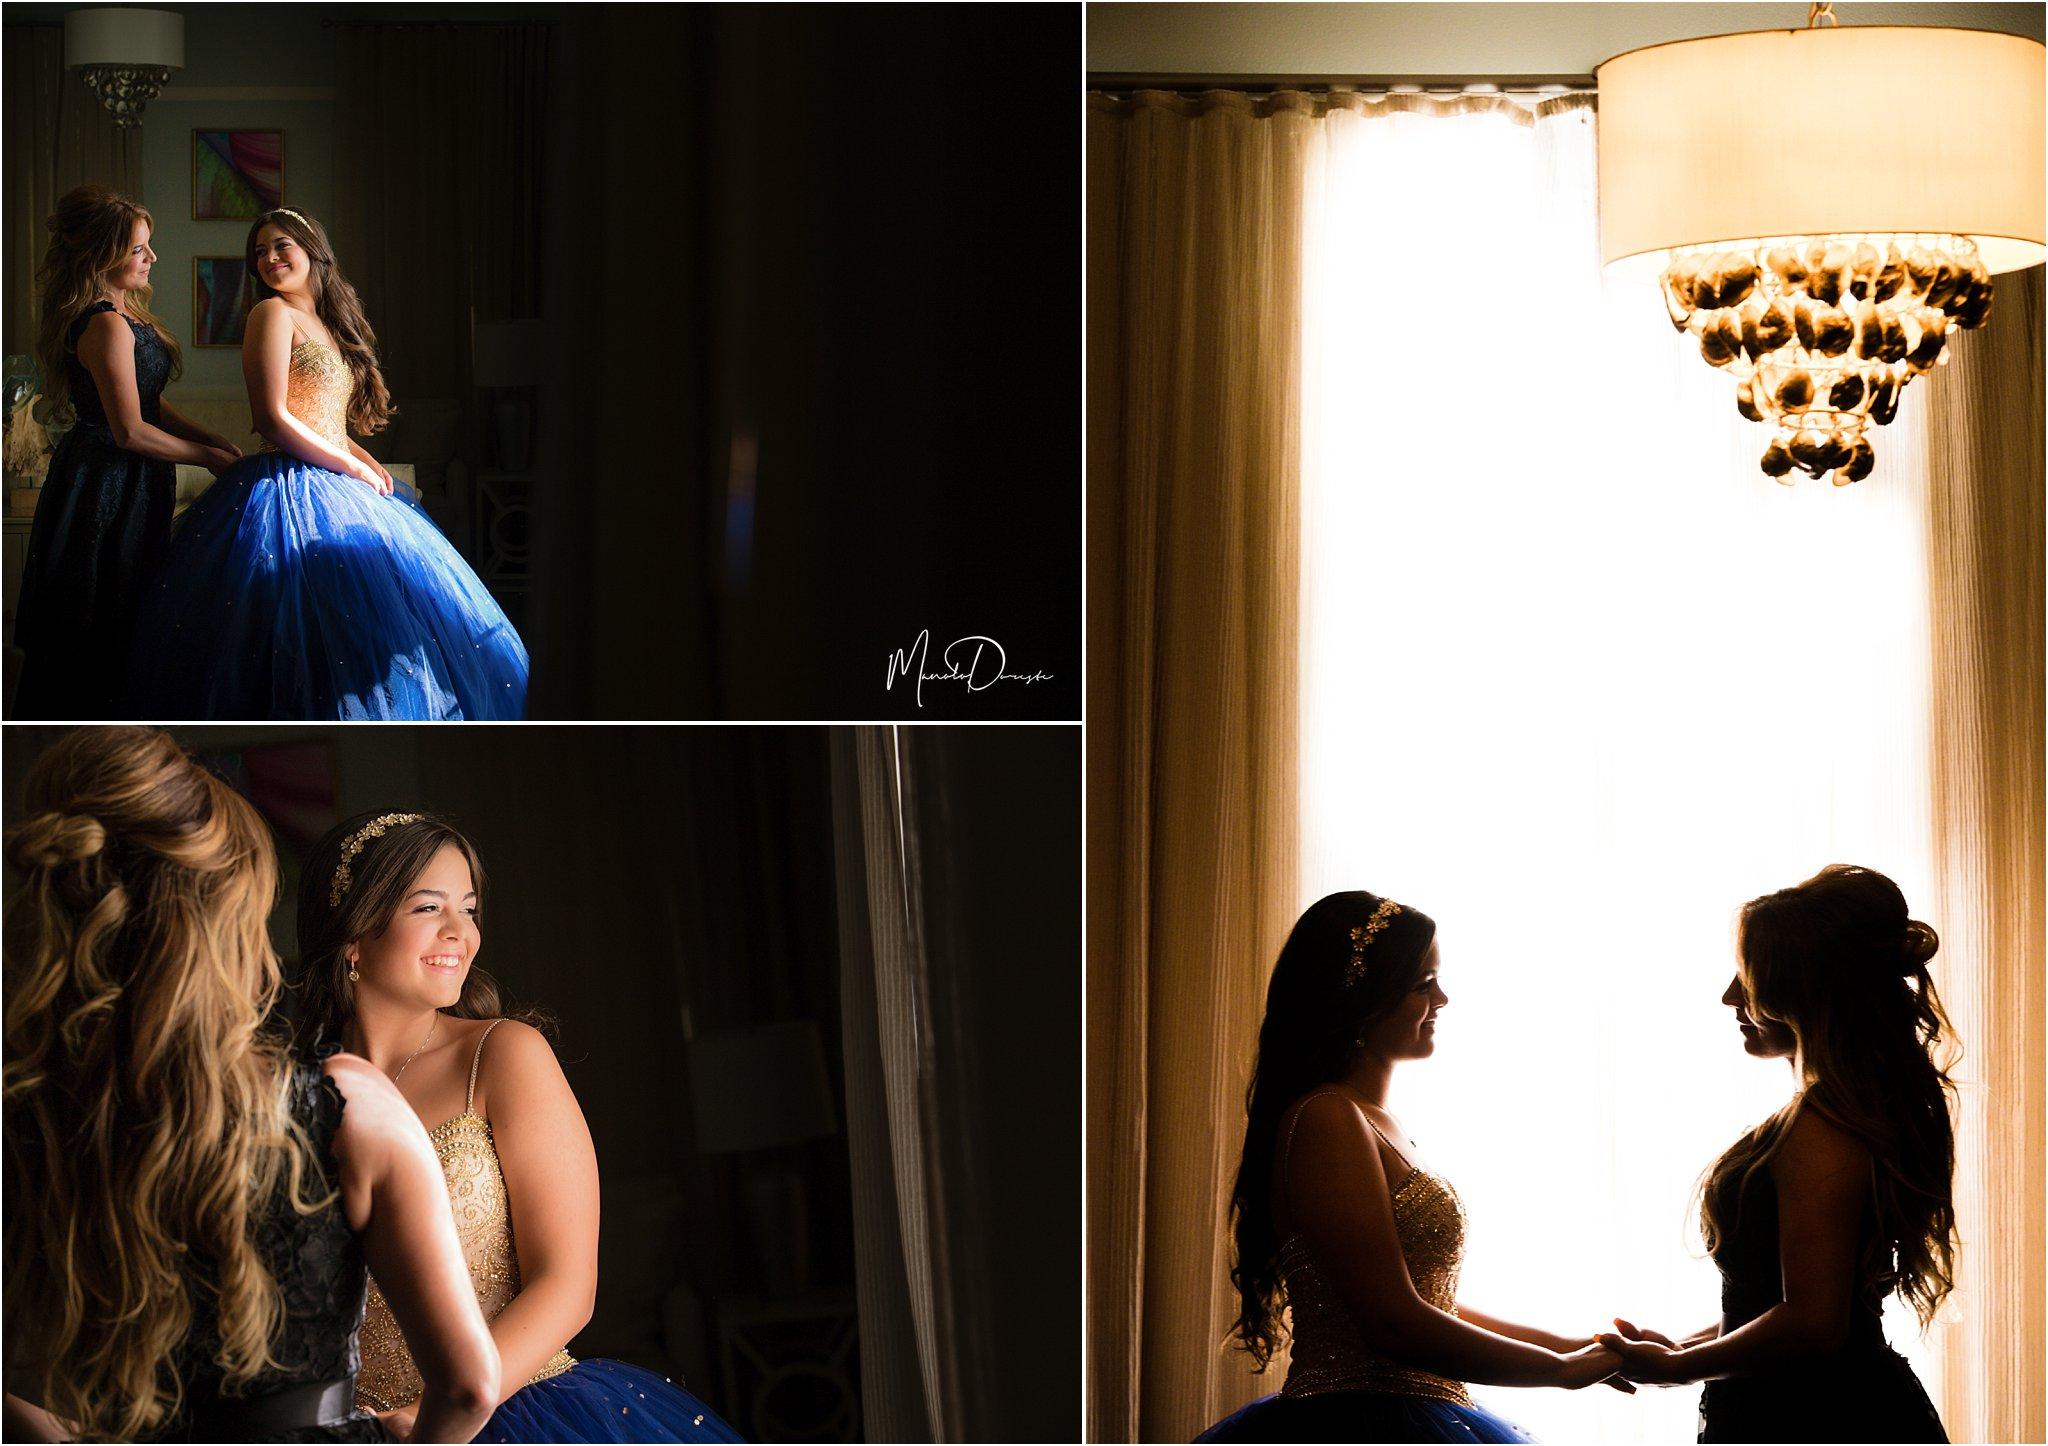 0276_ManoloDoreste_InFocusStudios_Wedding_Family_Photography_Miami_MiamiPhotographer.jpg